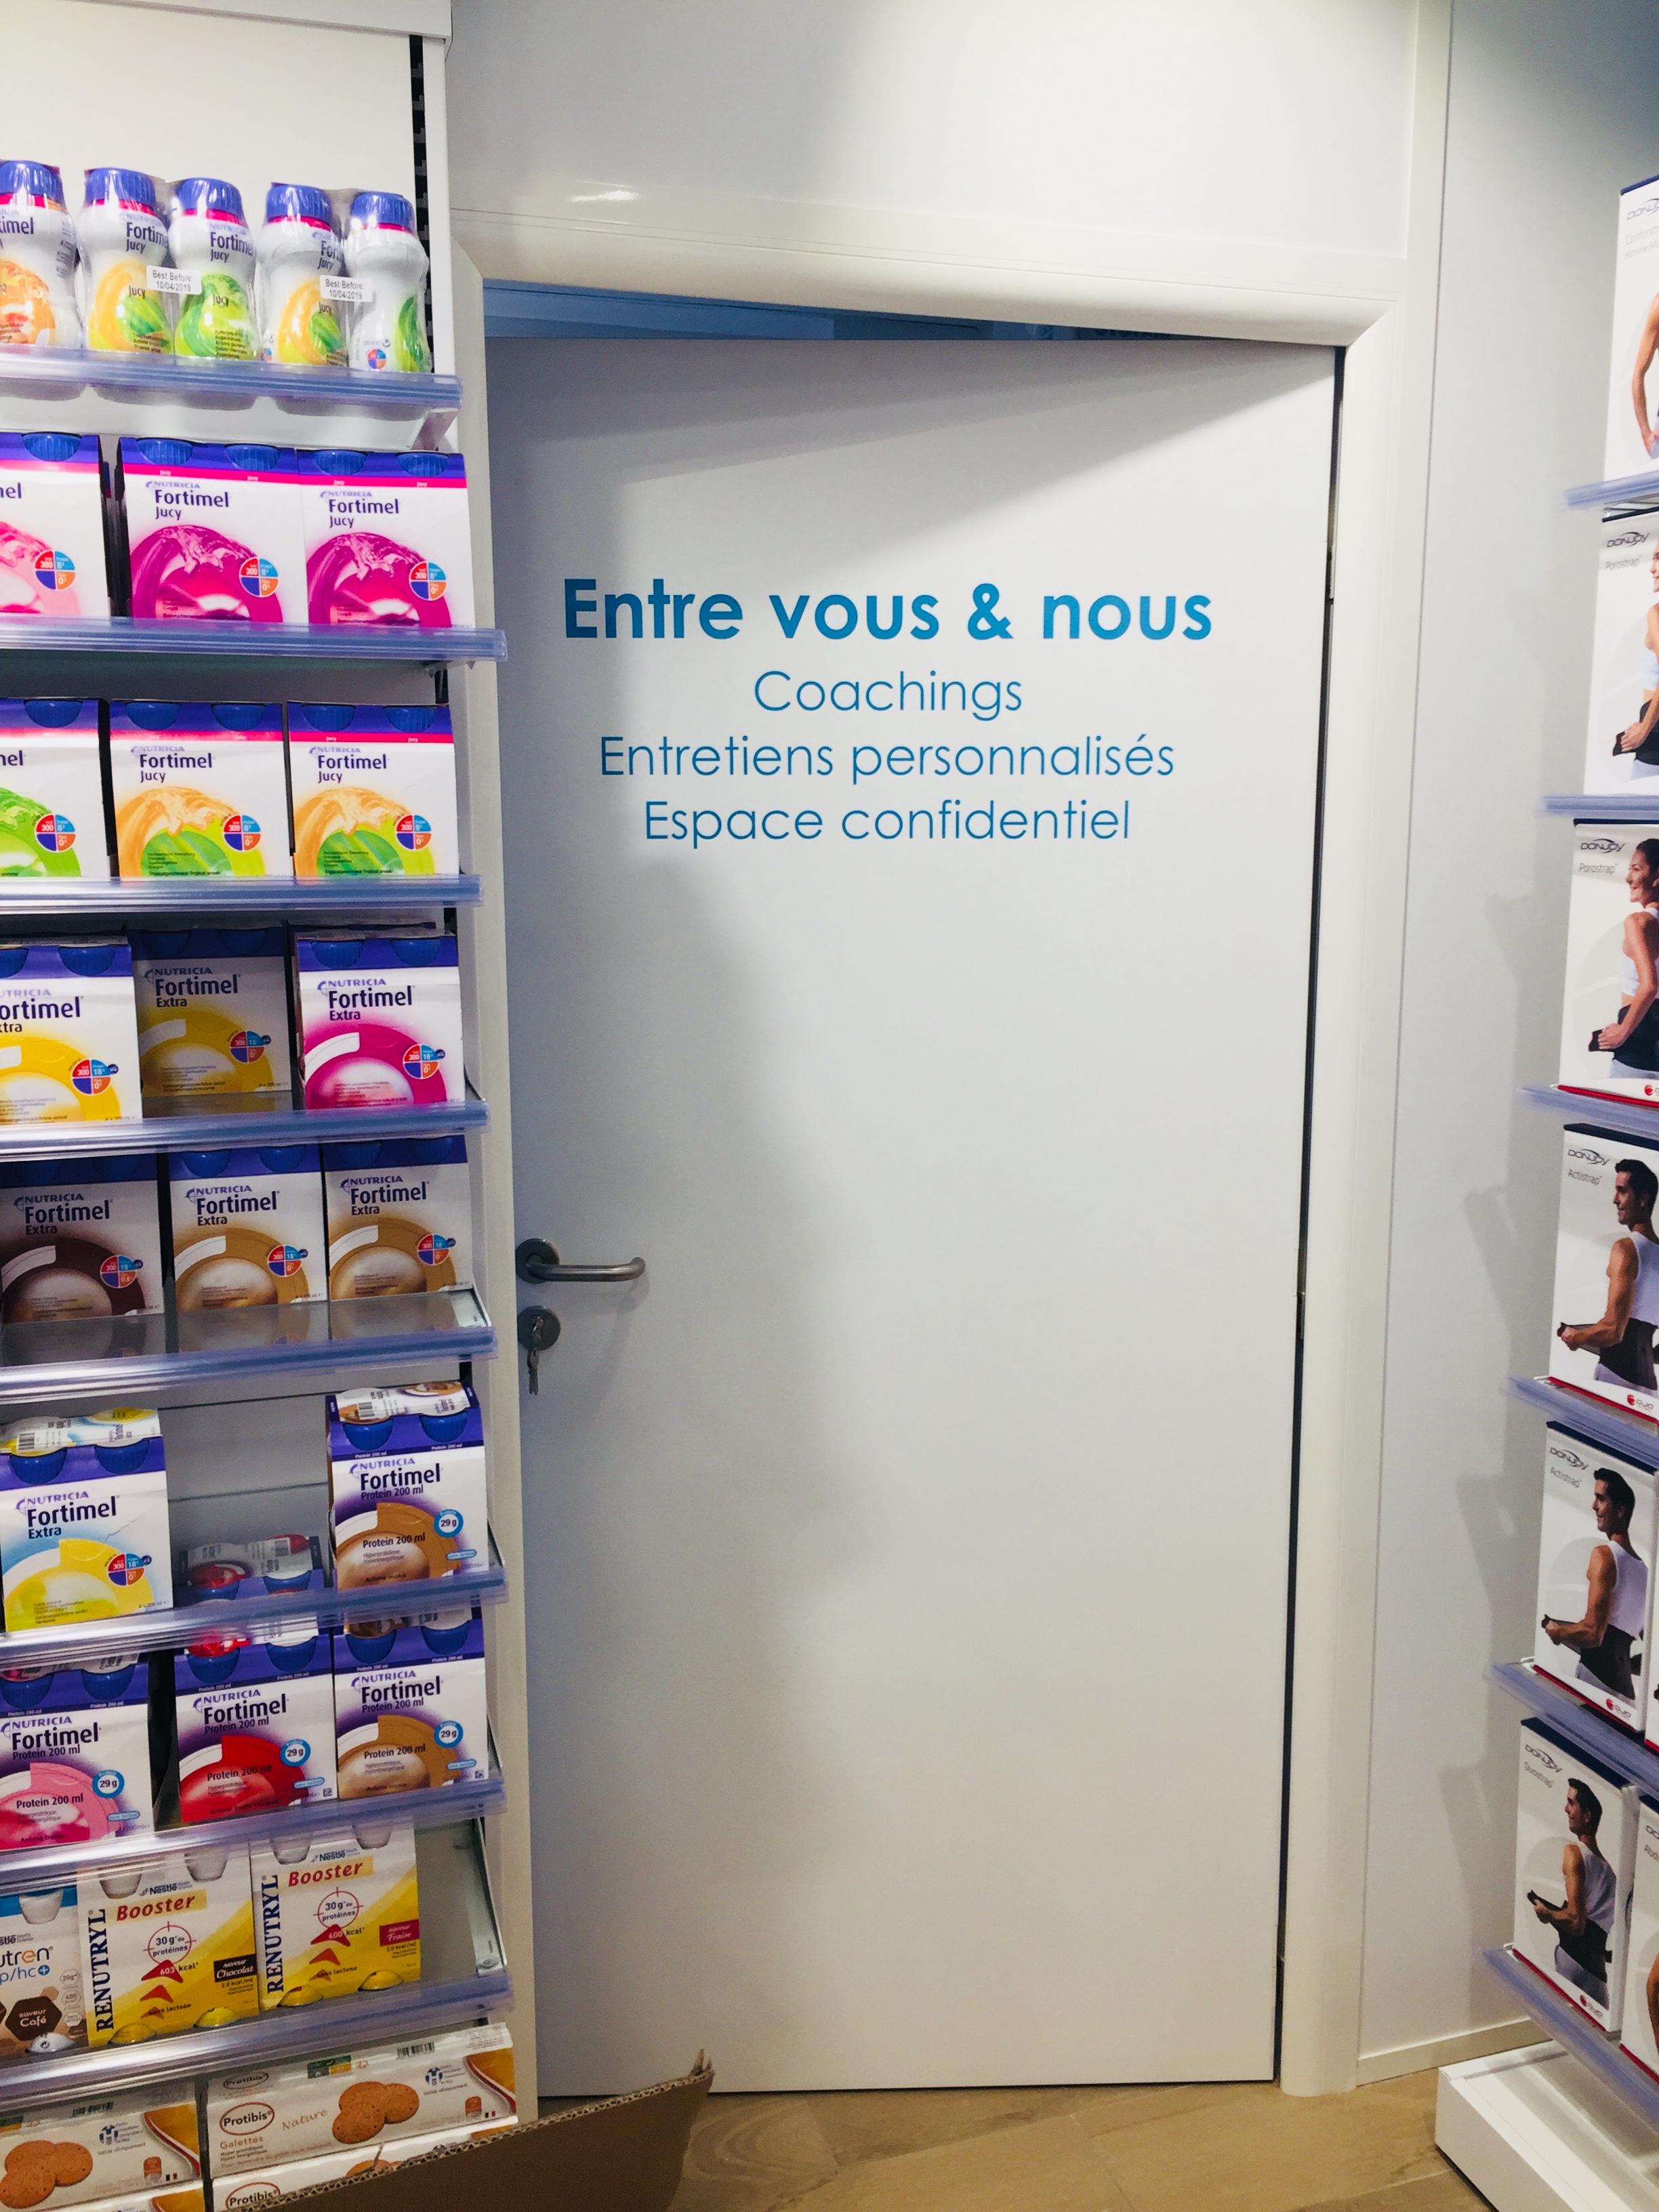 Pharmacie wellpharma | Pharmacie de la Croix de Lorraine